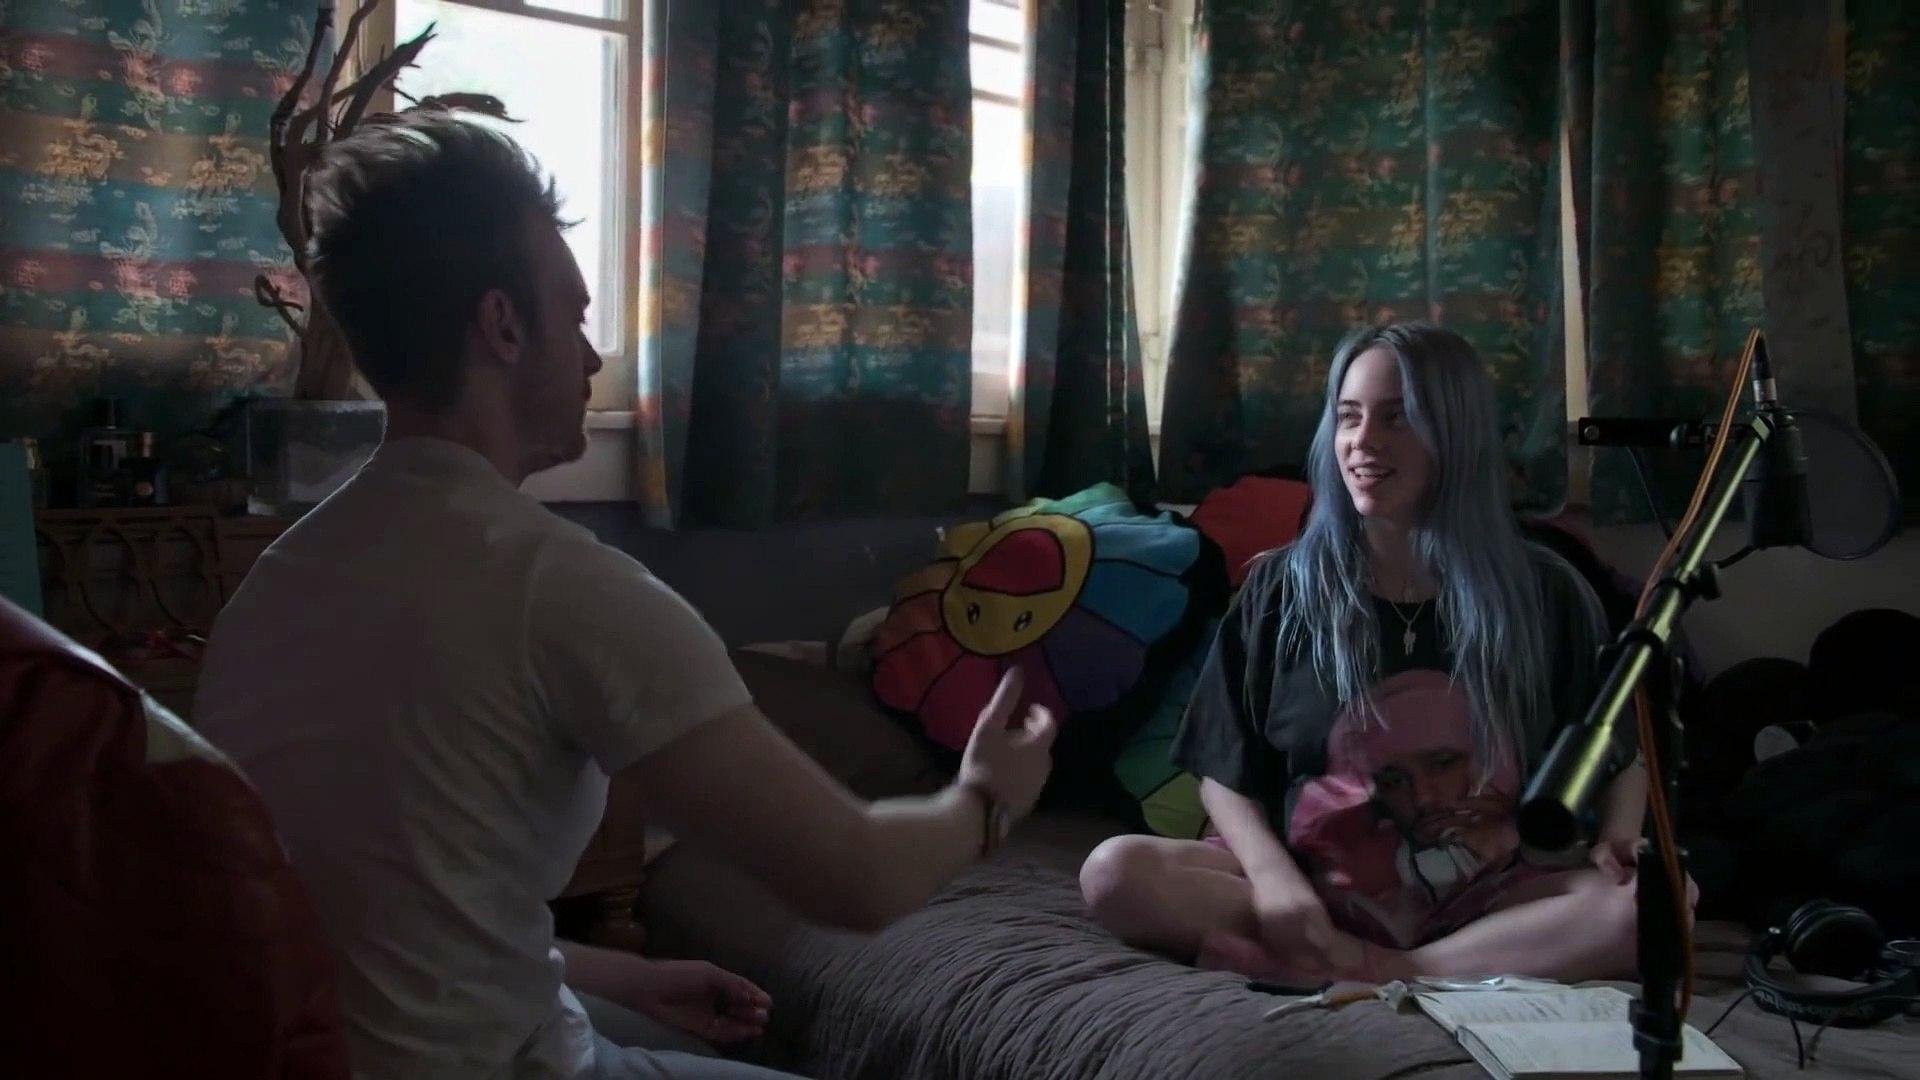 Billie Eilish: The World's a Little Blurry - Official Trailer  Apple TV+